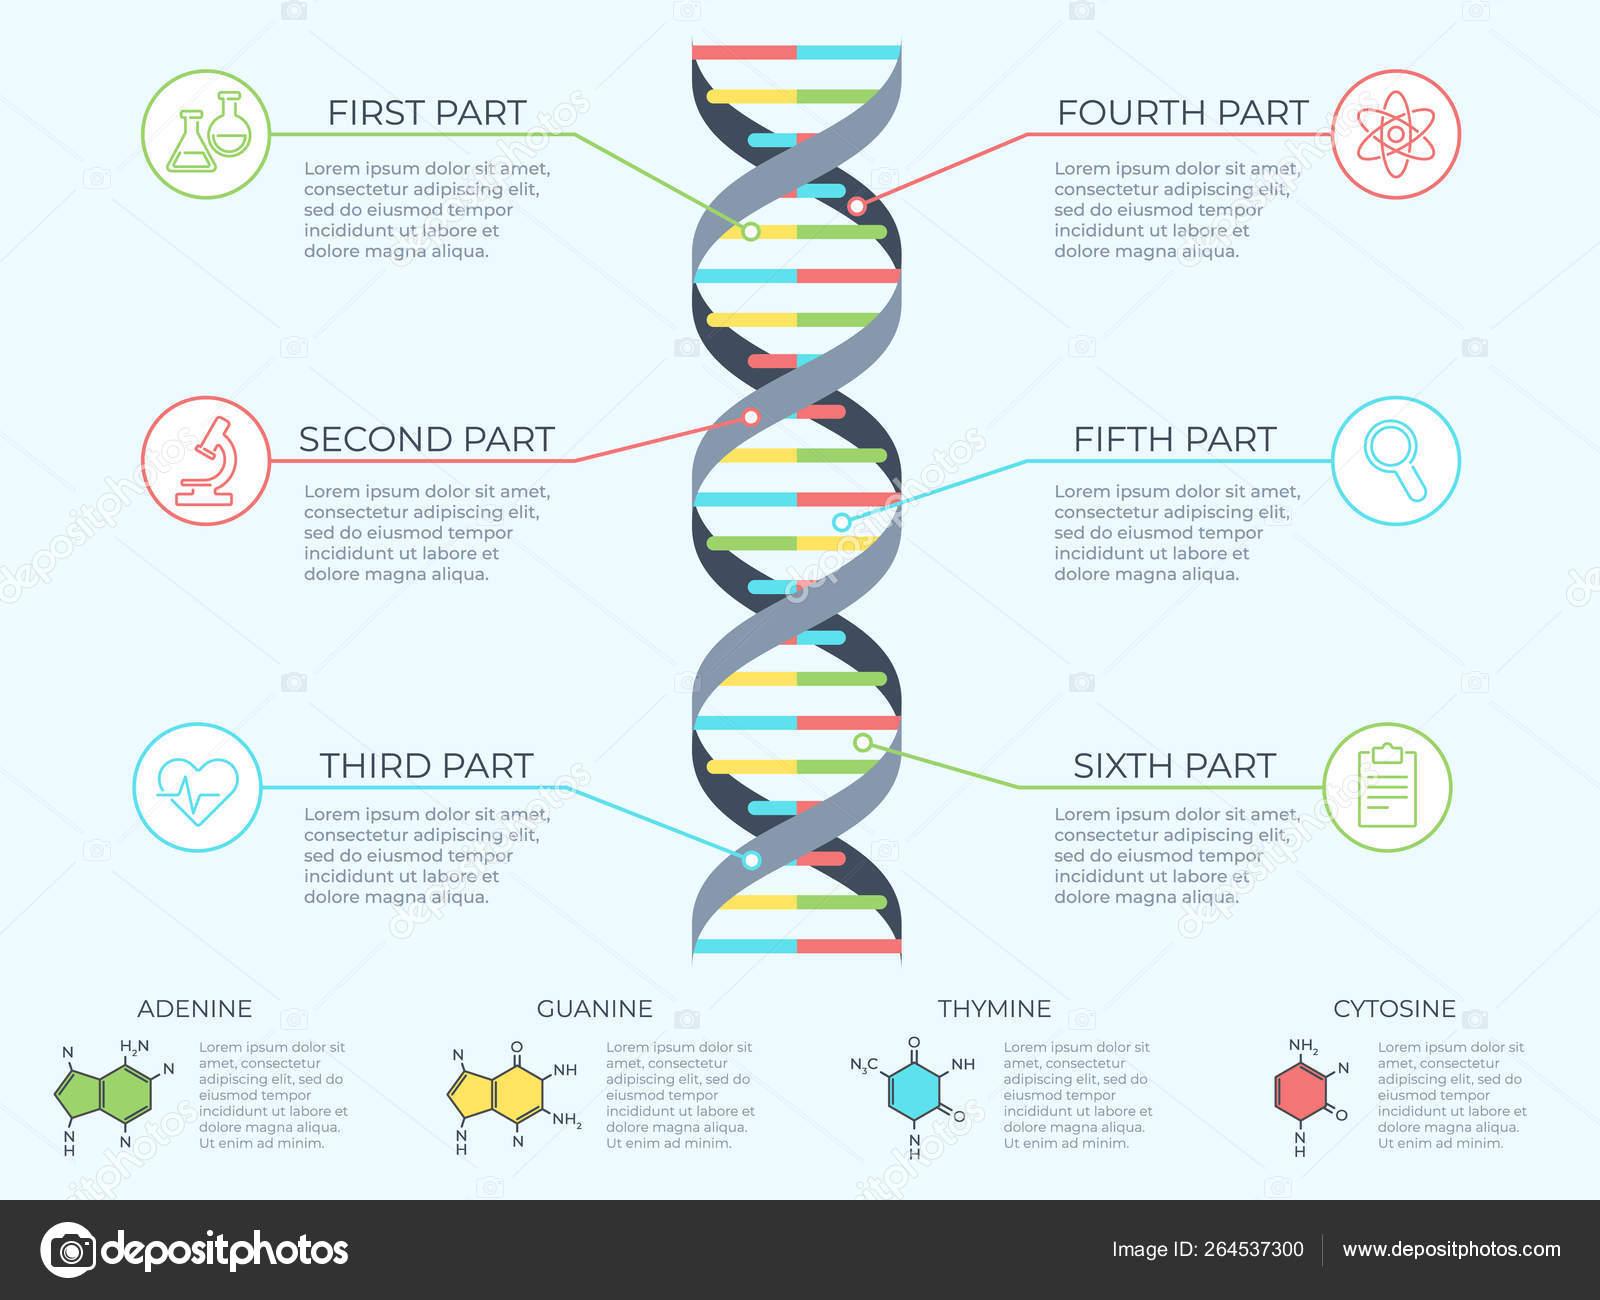 dna infographic  genetic spiral, genomic model molecule diagram and adn  pattern structure chart  medicine molecular rna, chromosome infographics or dna  gene